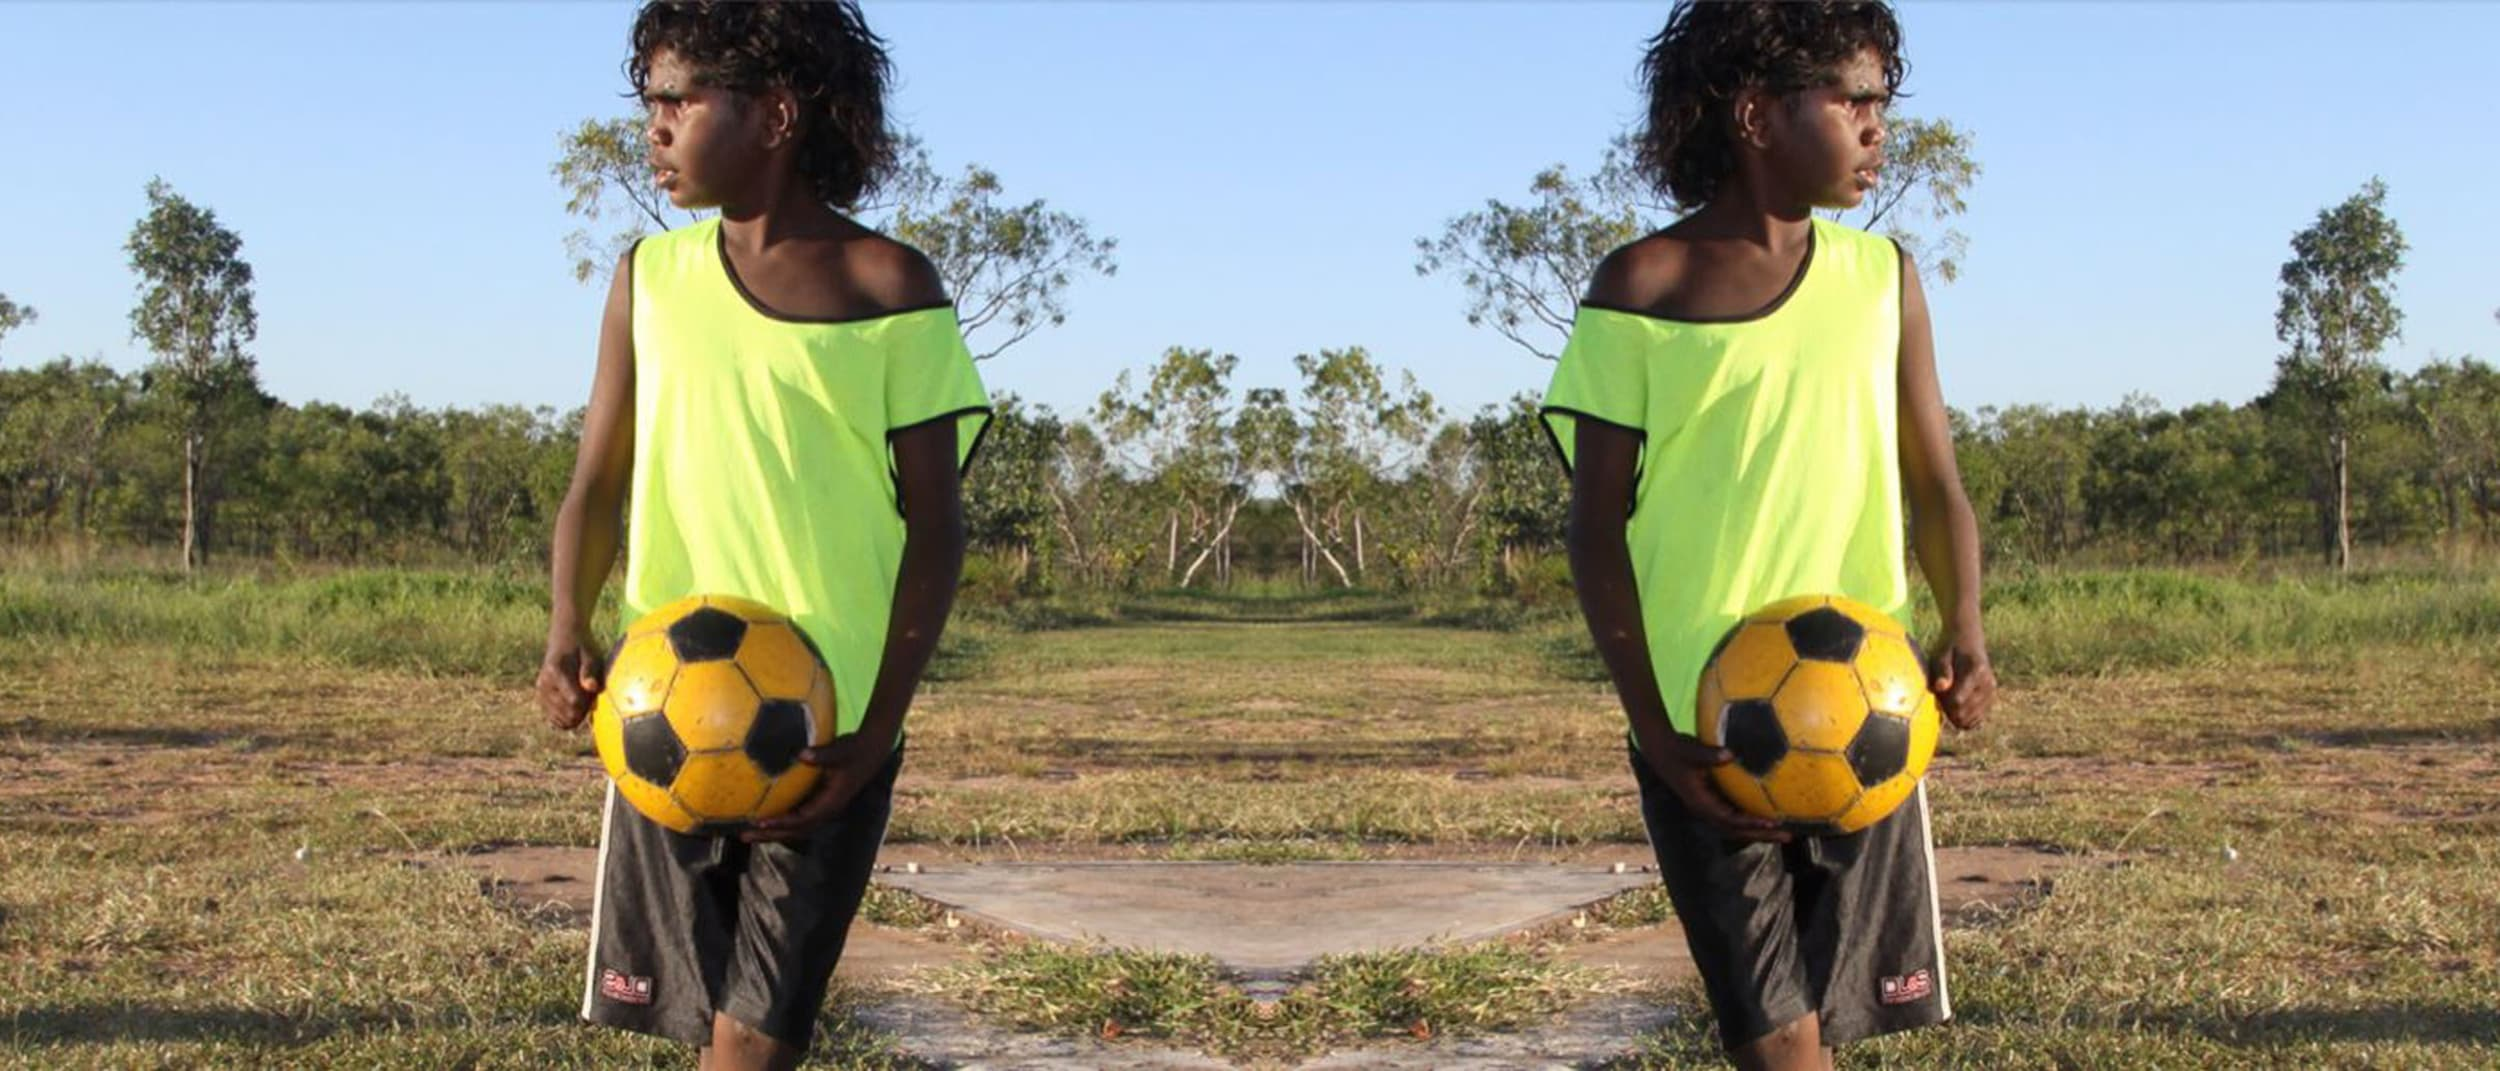 Football donation drive with The Nangala Project